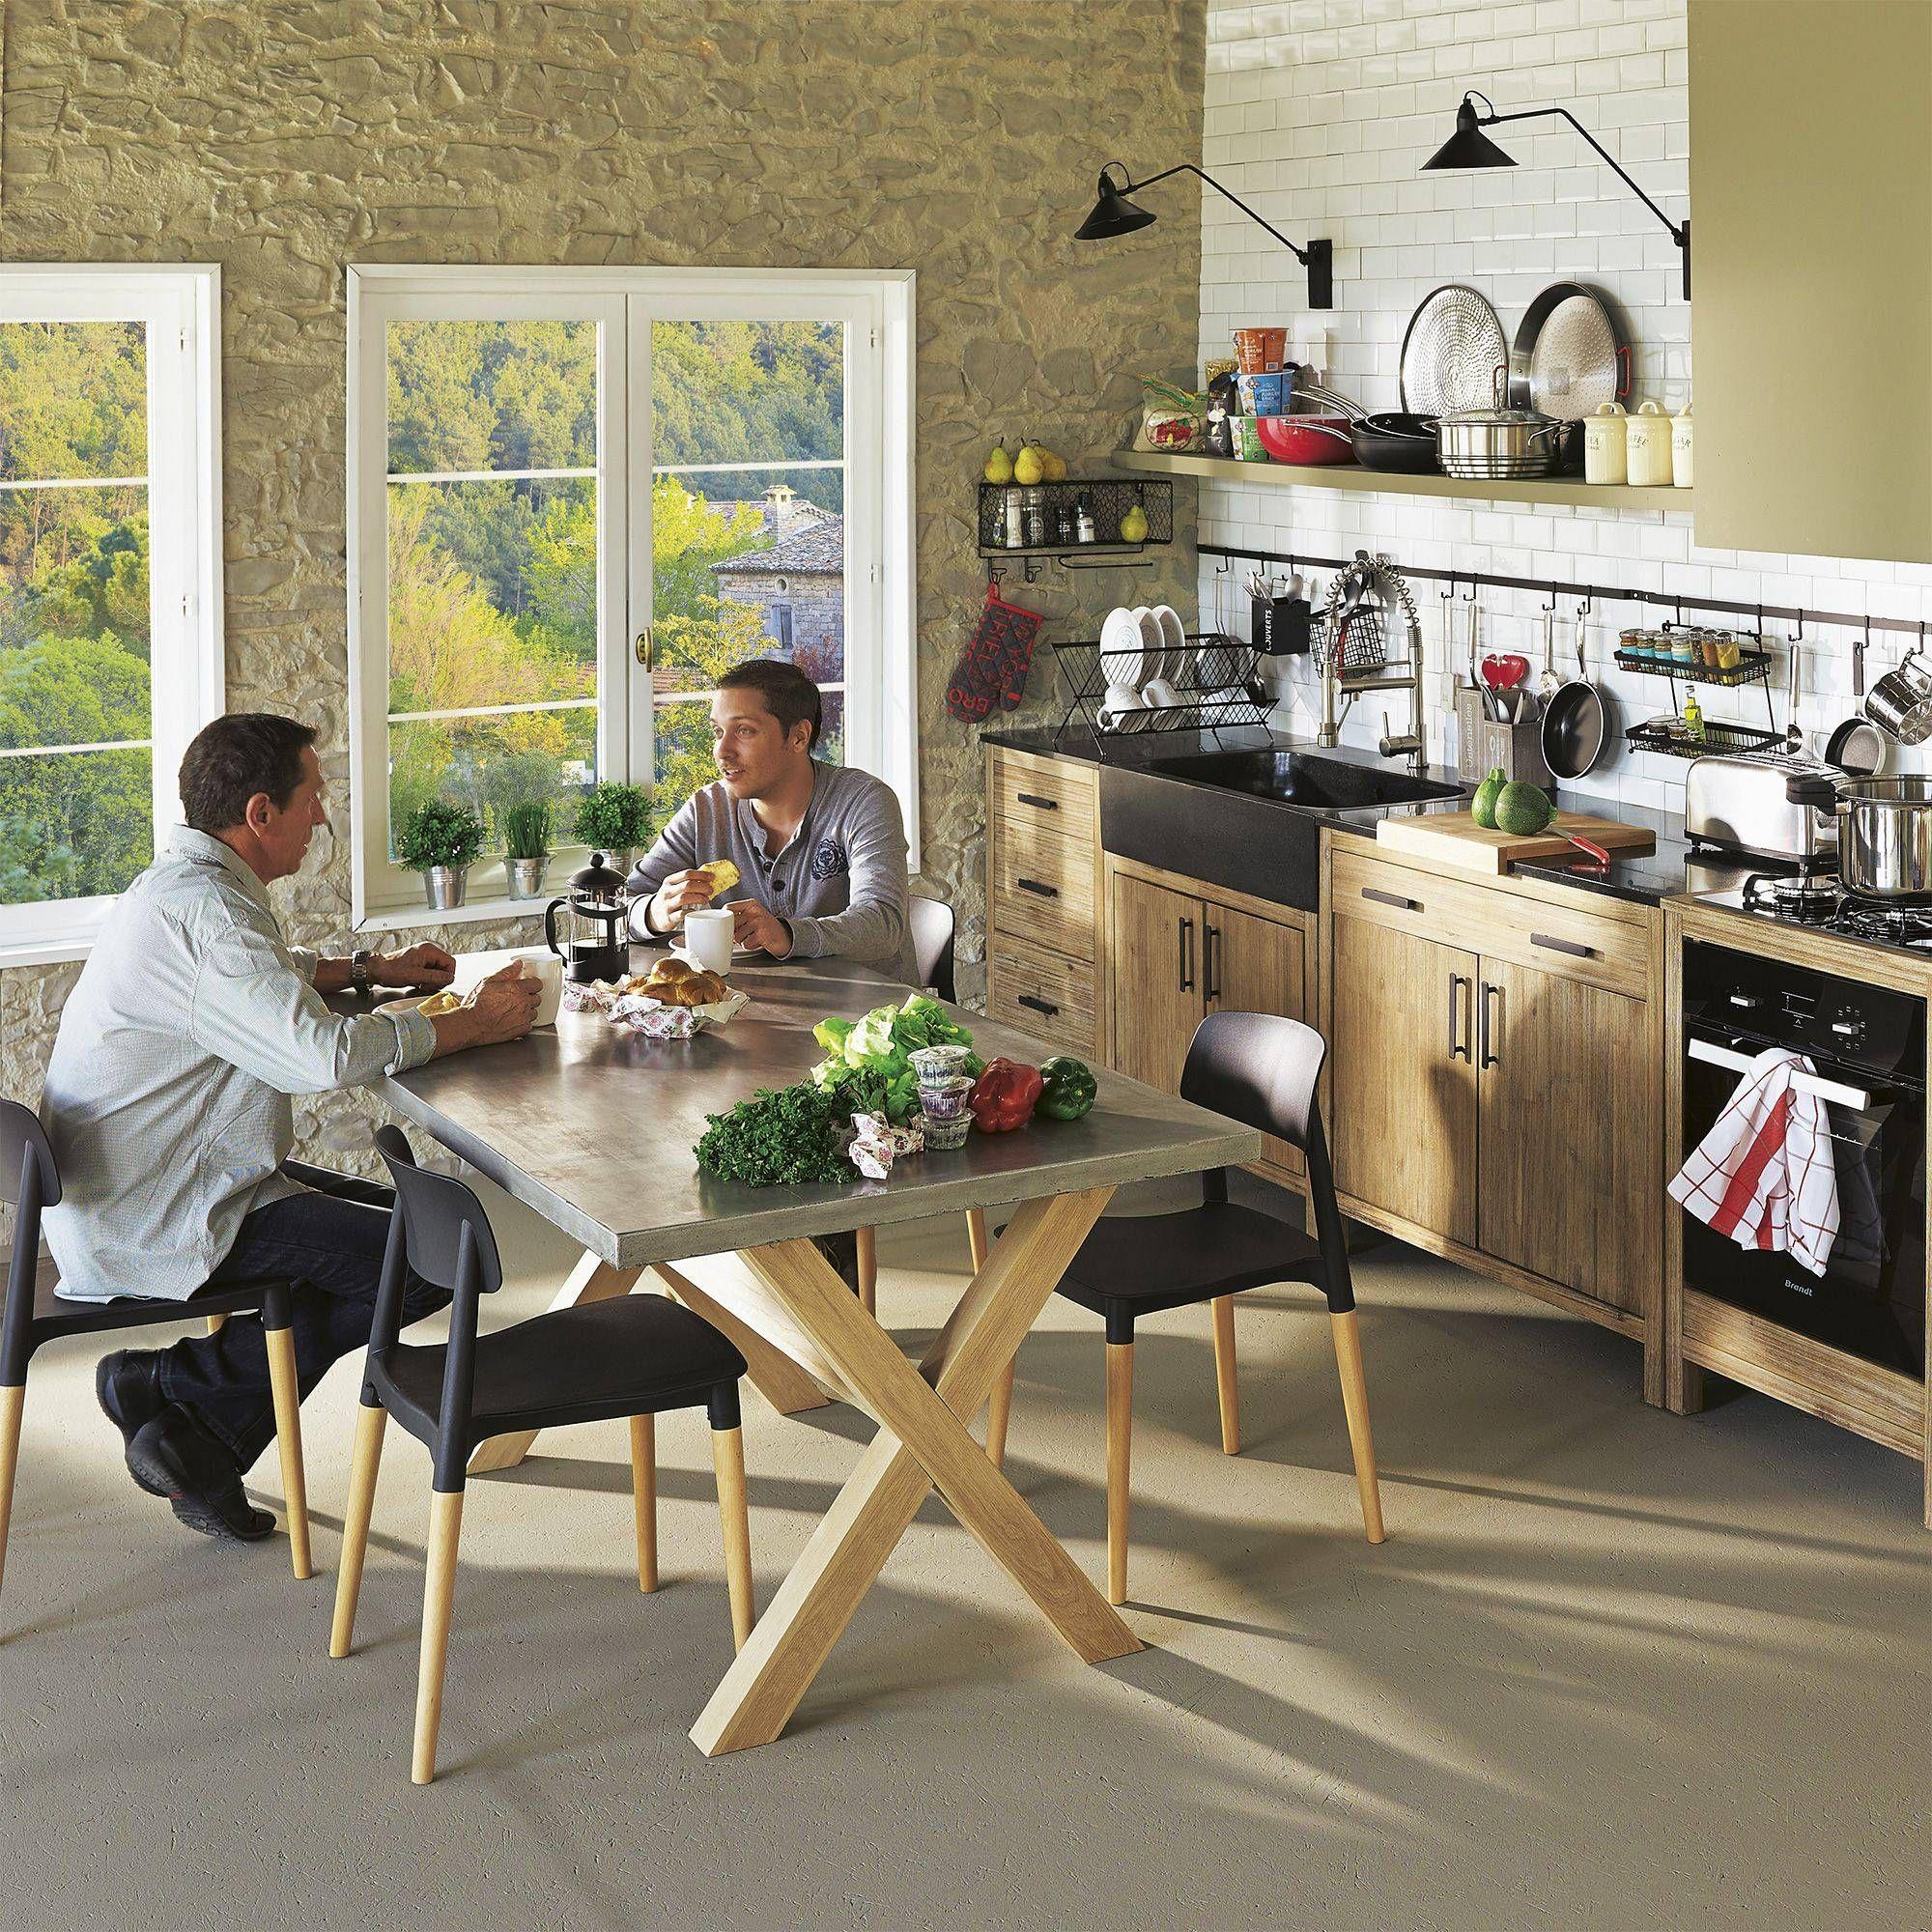 alinea lys meuble de cuisine bas 3 tiroirs | meubles maison ... - Meuble Bas Cuisine 3 Tiroirs